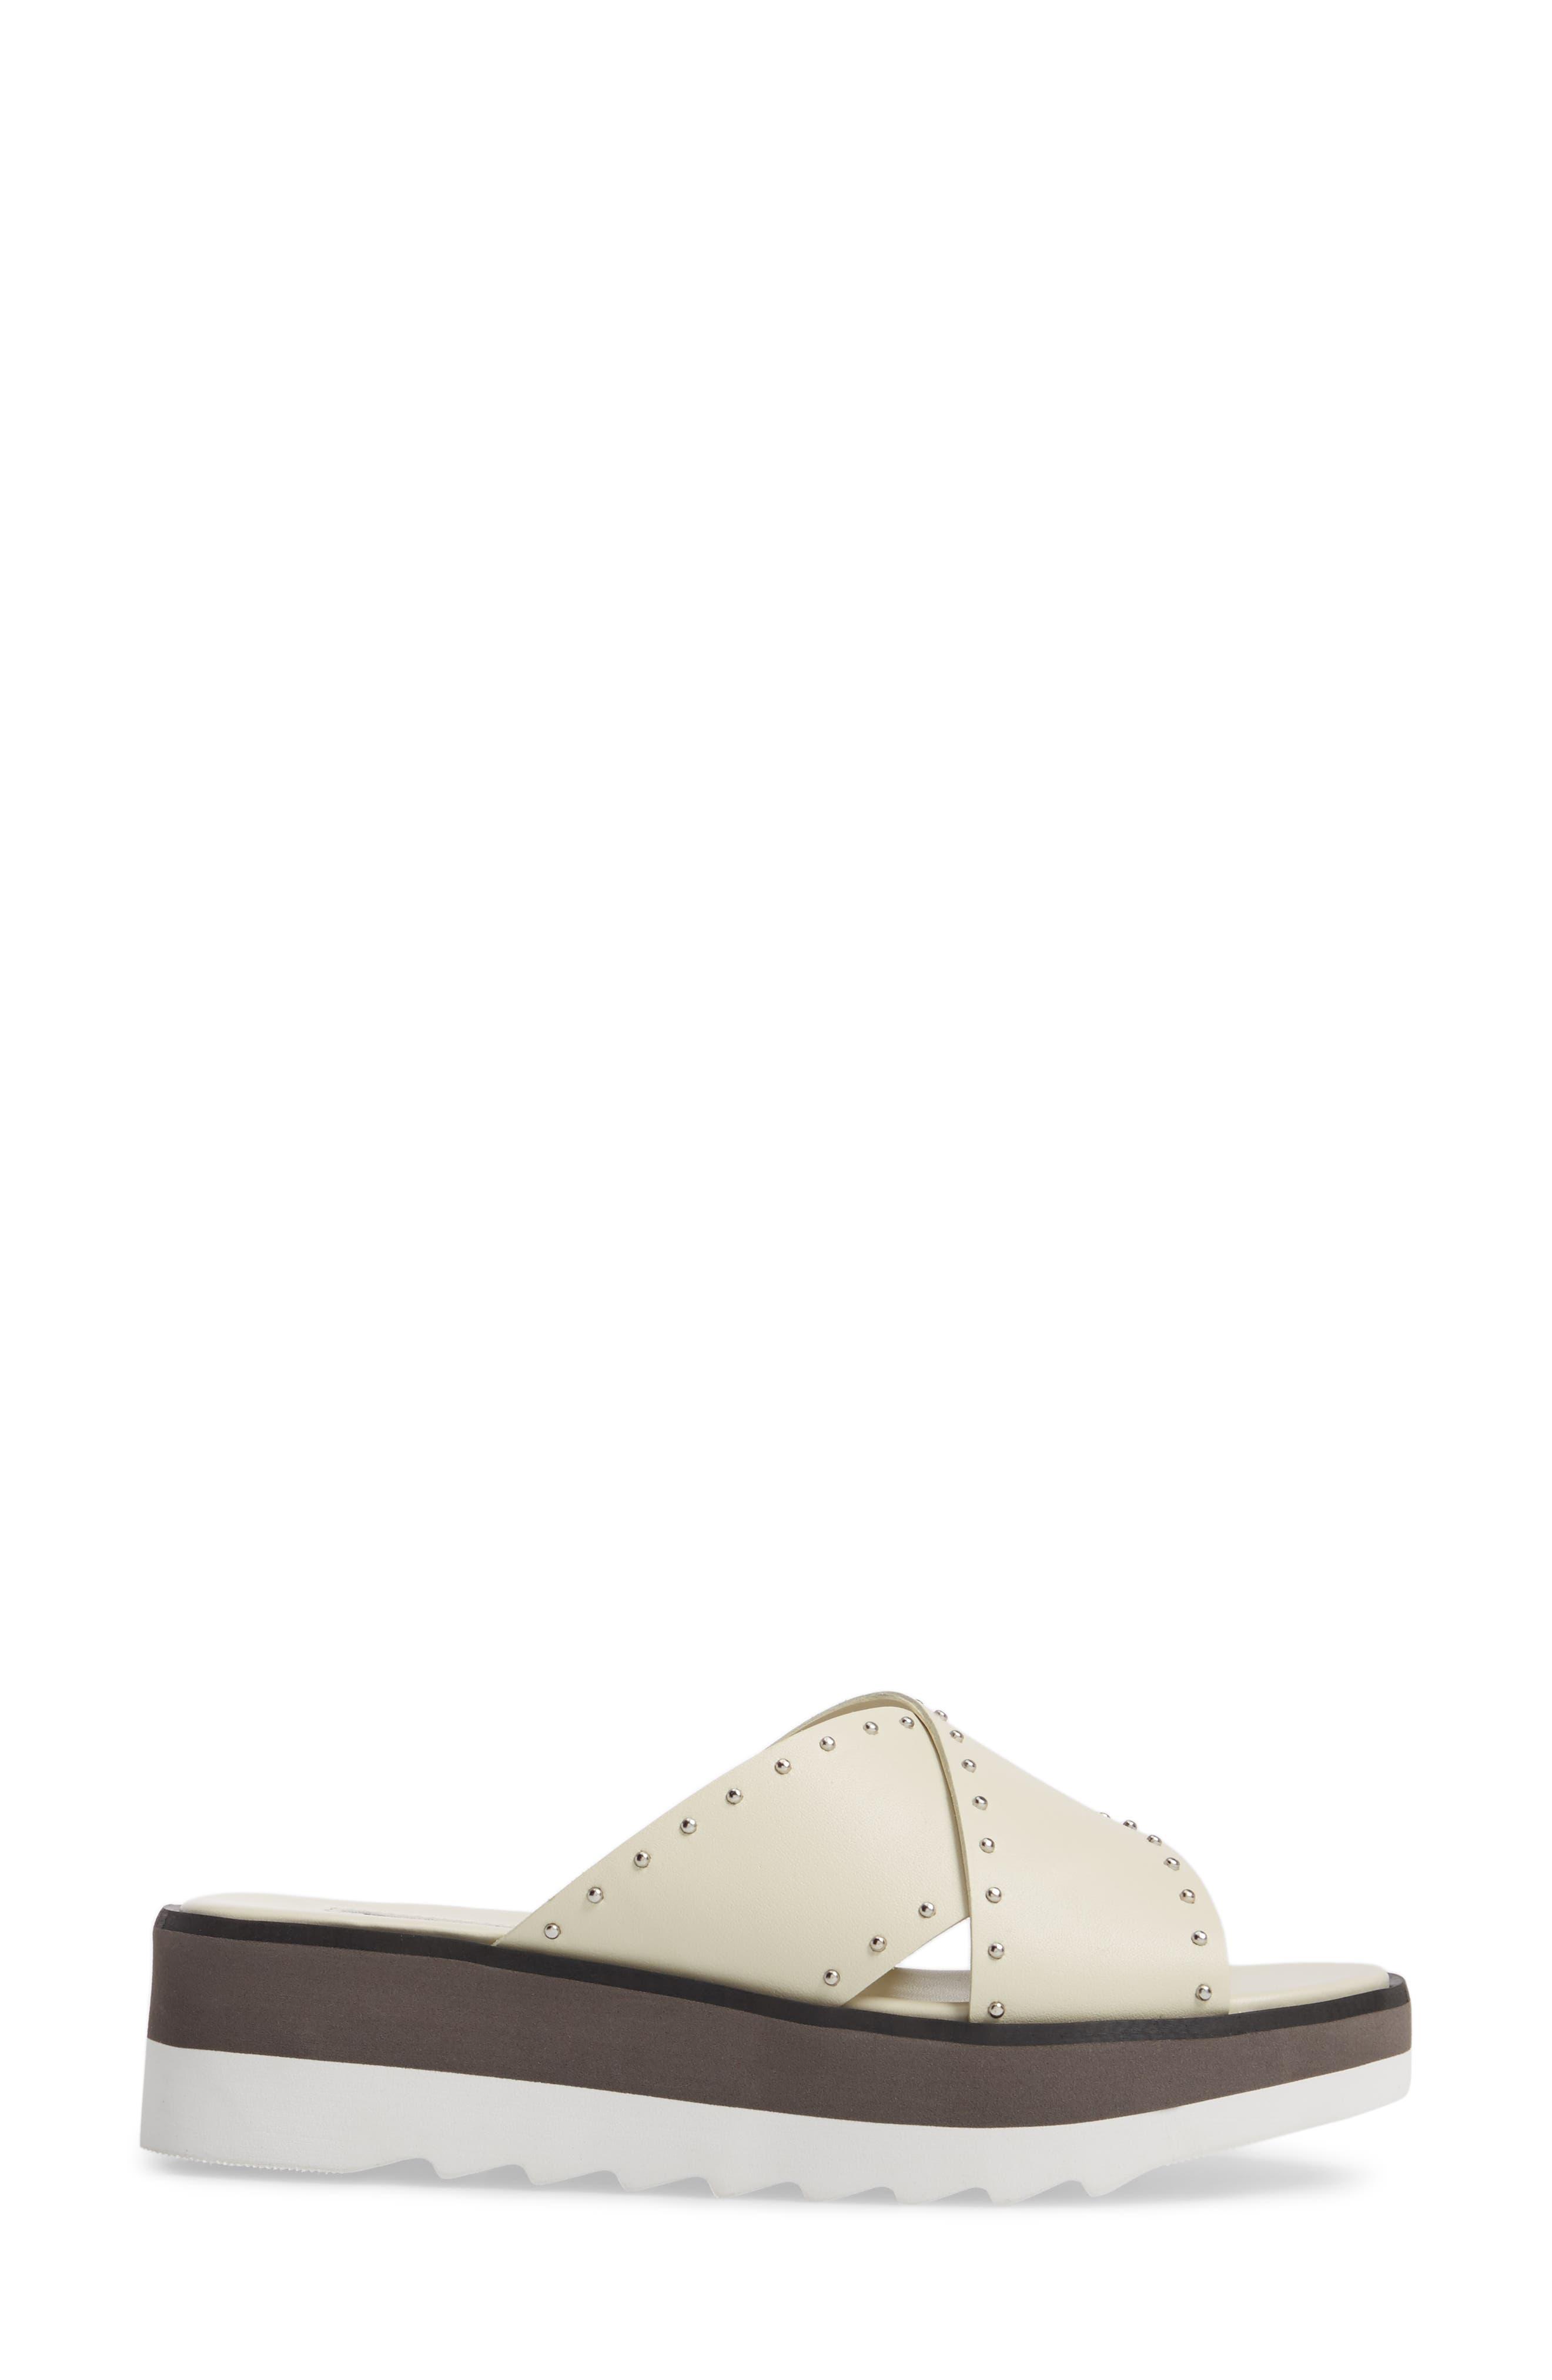 Buxom Sandal,                             Alternate thumbnail 3, color,                             WHITE LEATHER